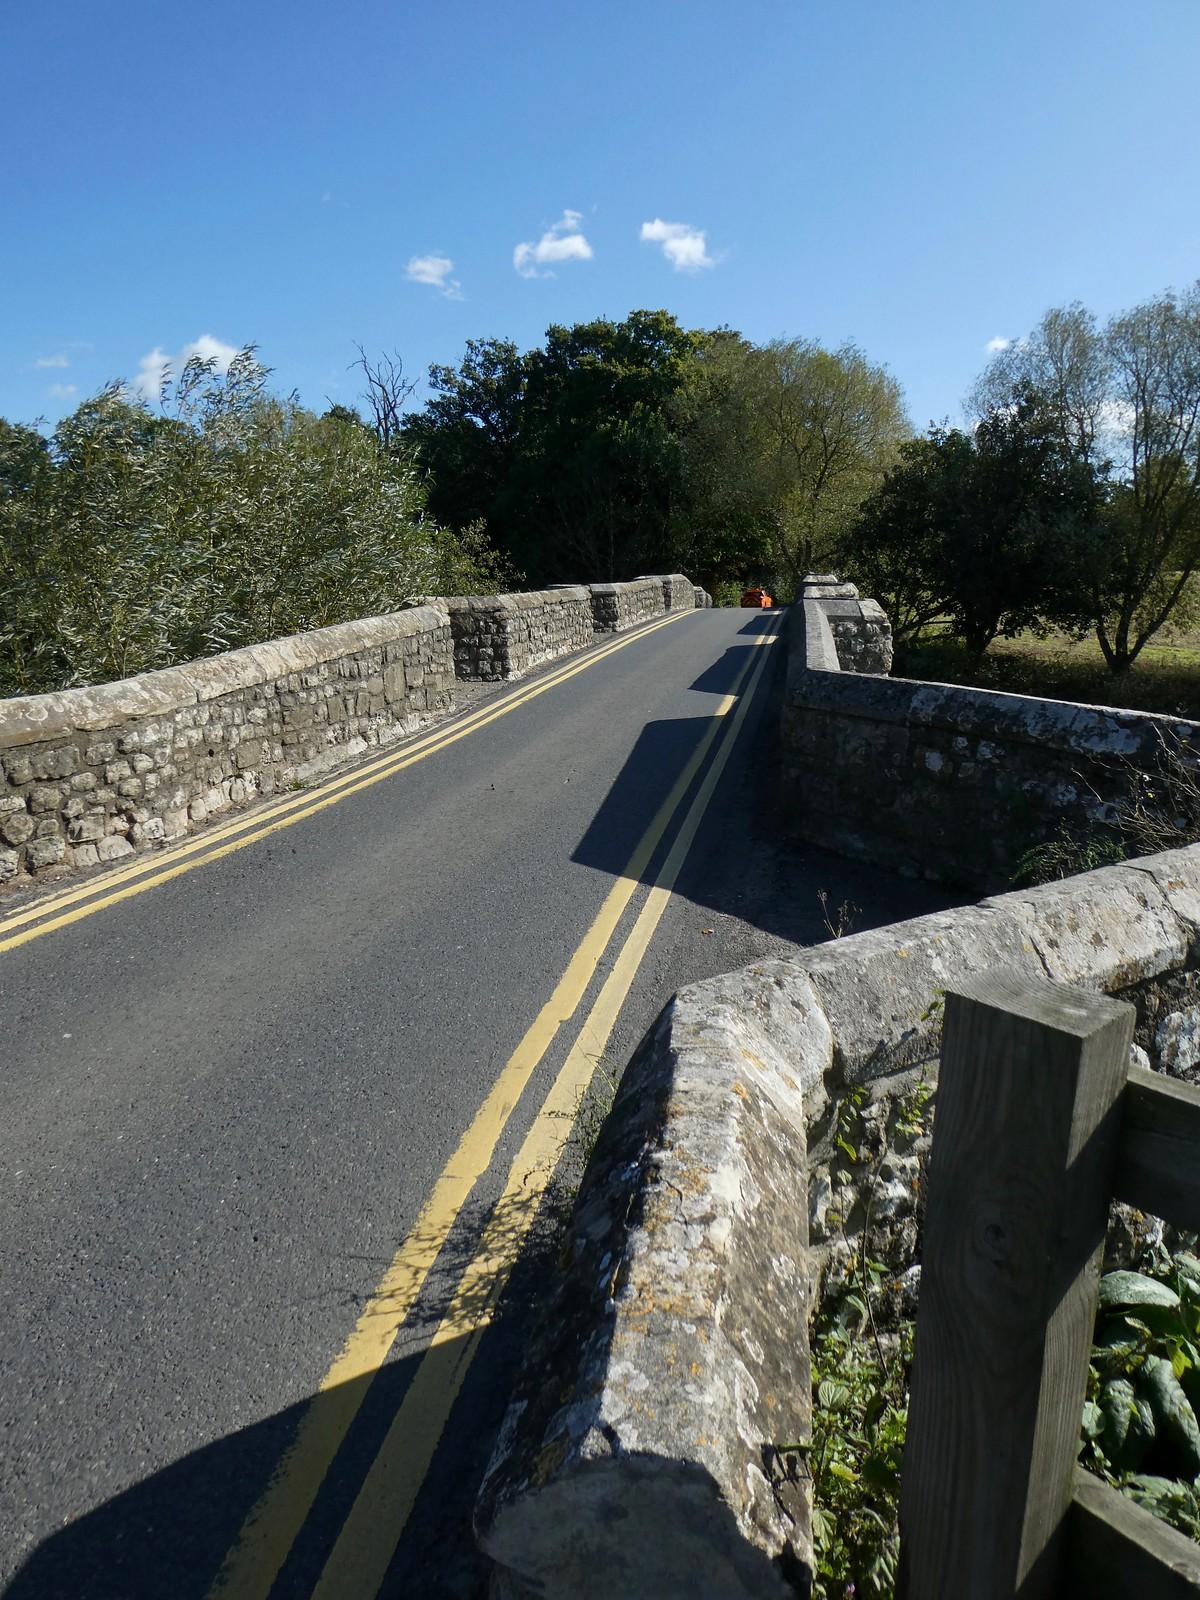 Crossing Teston Bridge Wateringbury Circular walk